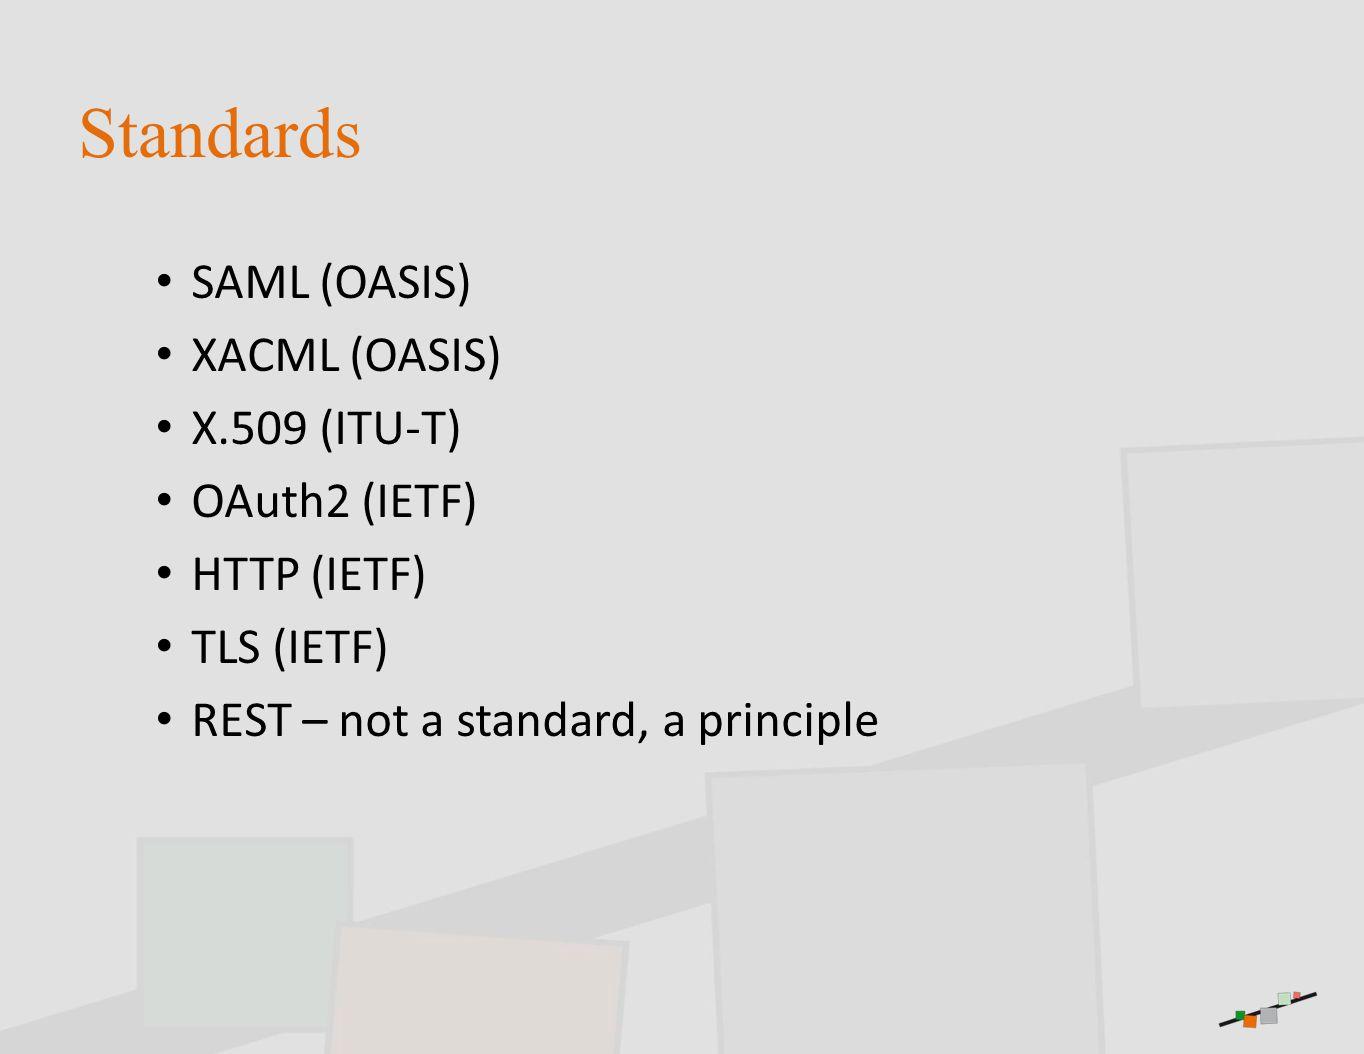 Standards SAML (OASIS) XACML (OASIS) X.509 (ITU-T) OAuth2 (IETF) HTTP (IETF) TLS (IETF) REST – not a standard, a principle